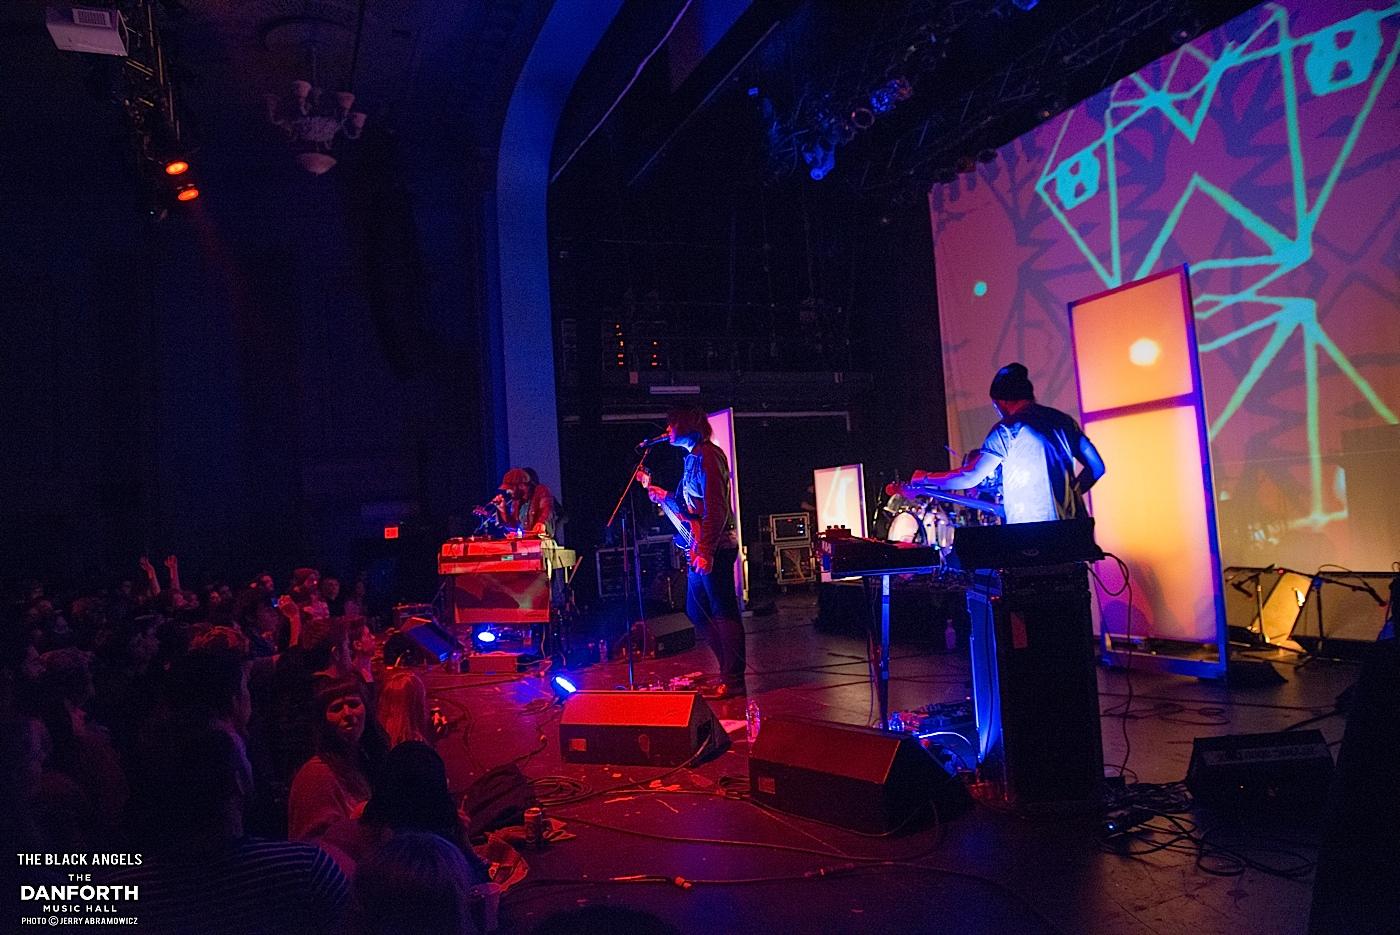 BLACK ANGELS perform at The Danforth Music Hall.